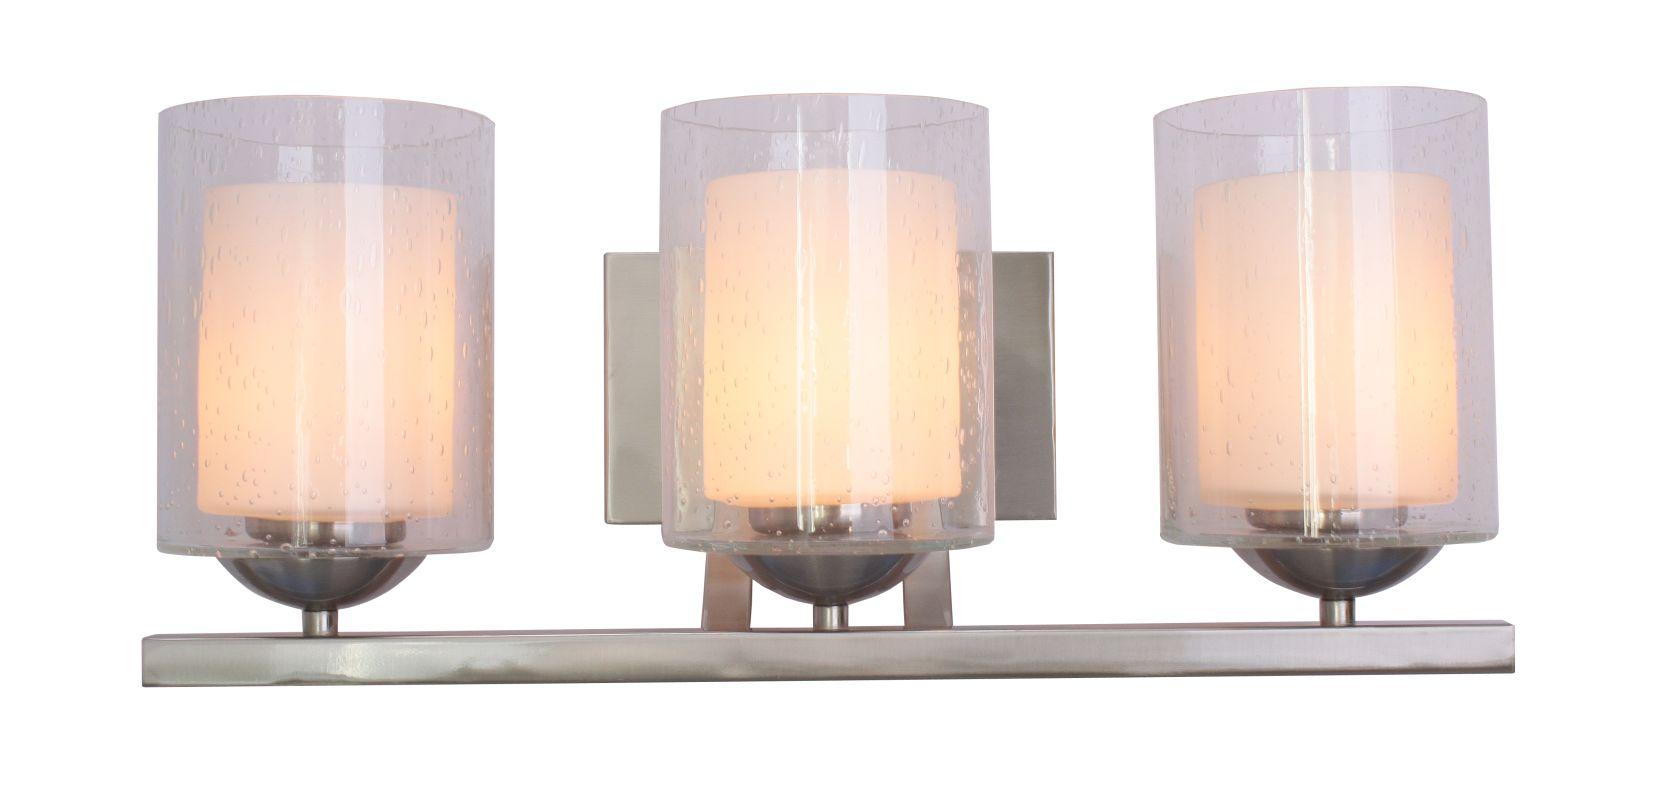 Woodbridge Lighting 53113 Cosmo 3 Light Vanity Light Satin Nickel